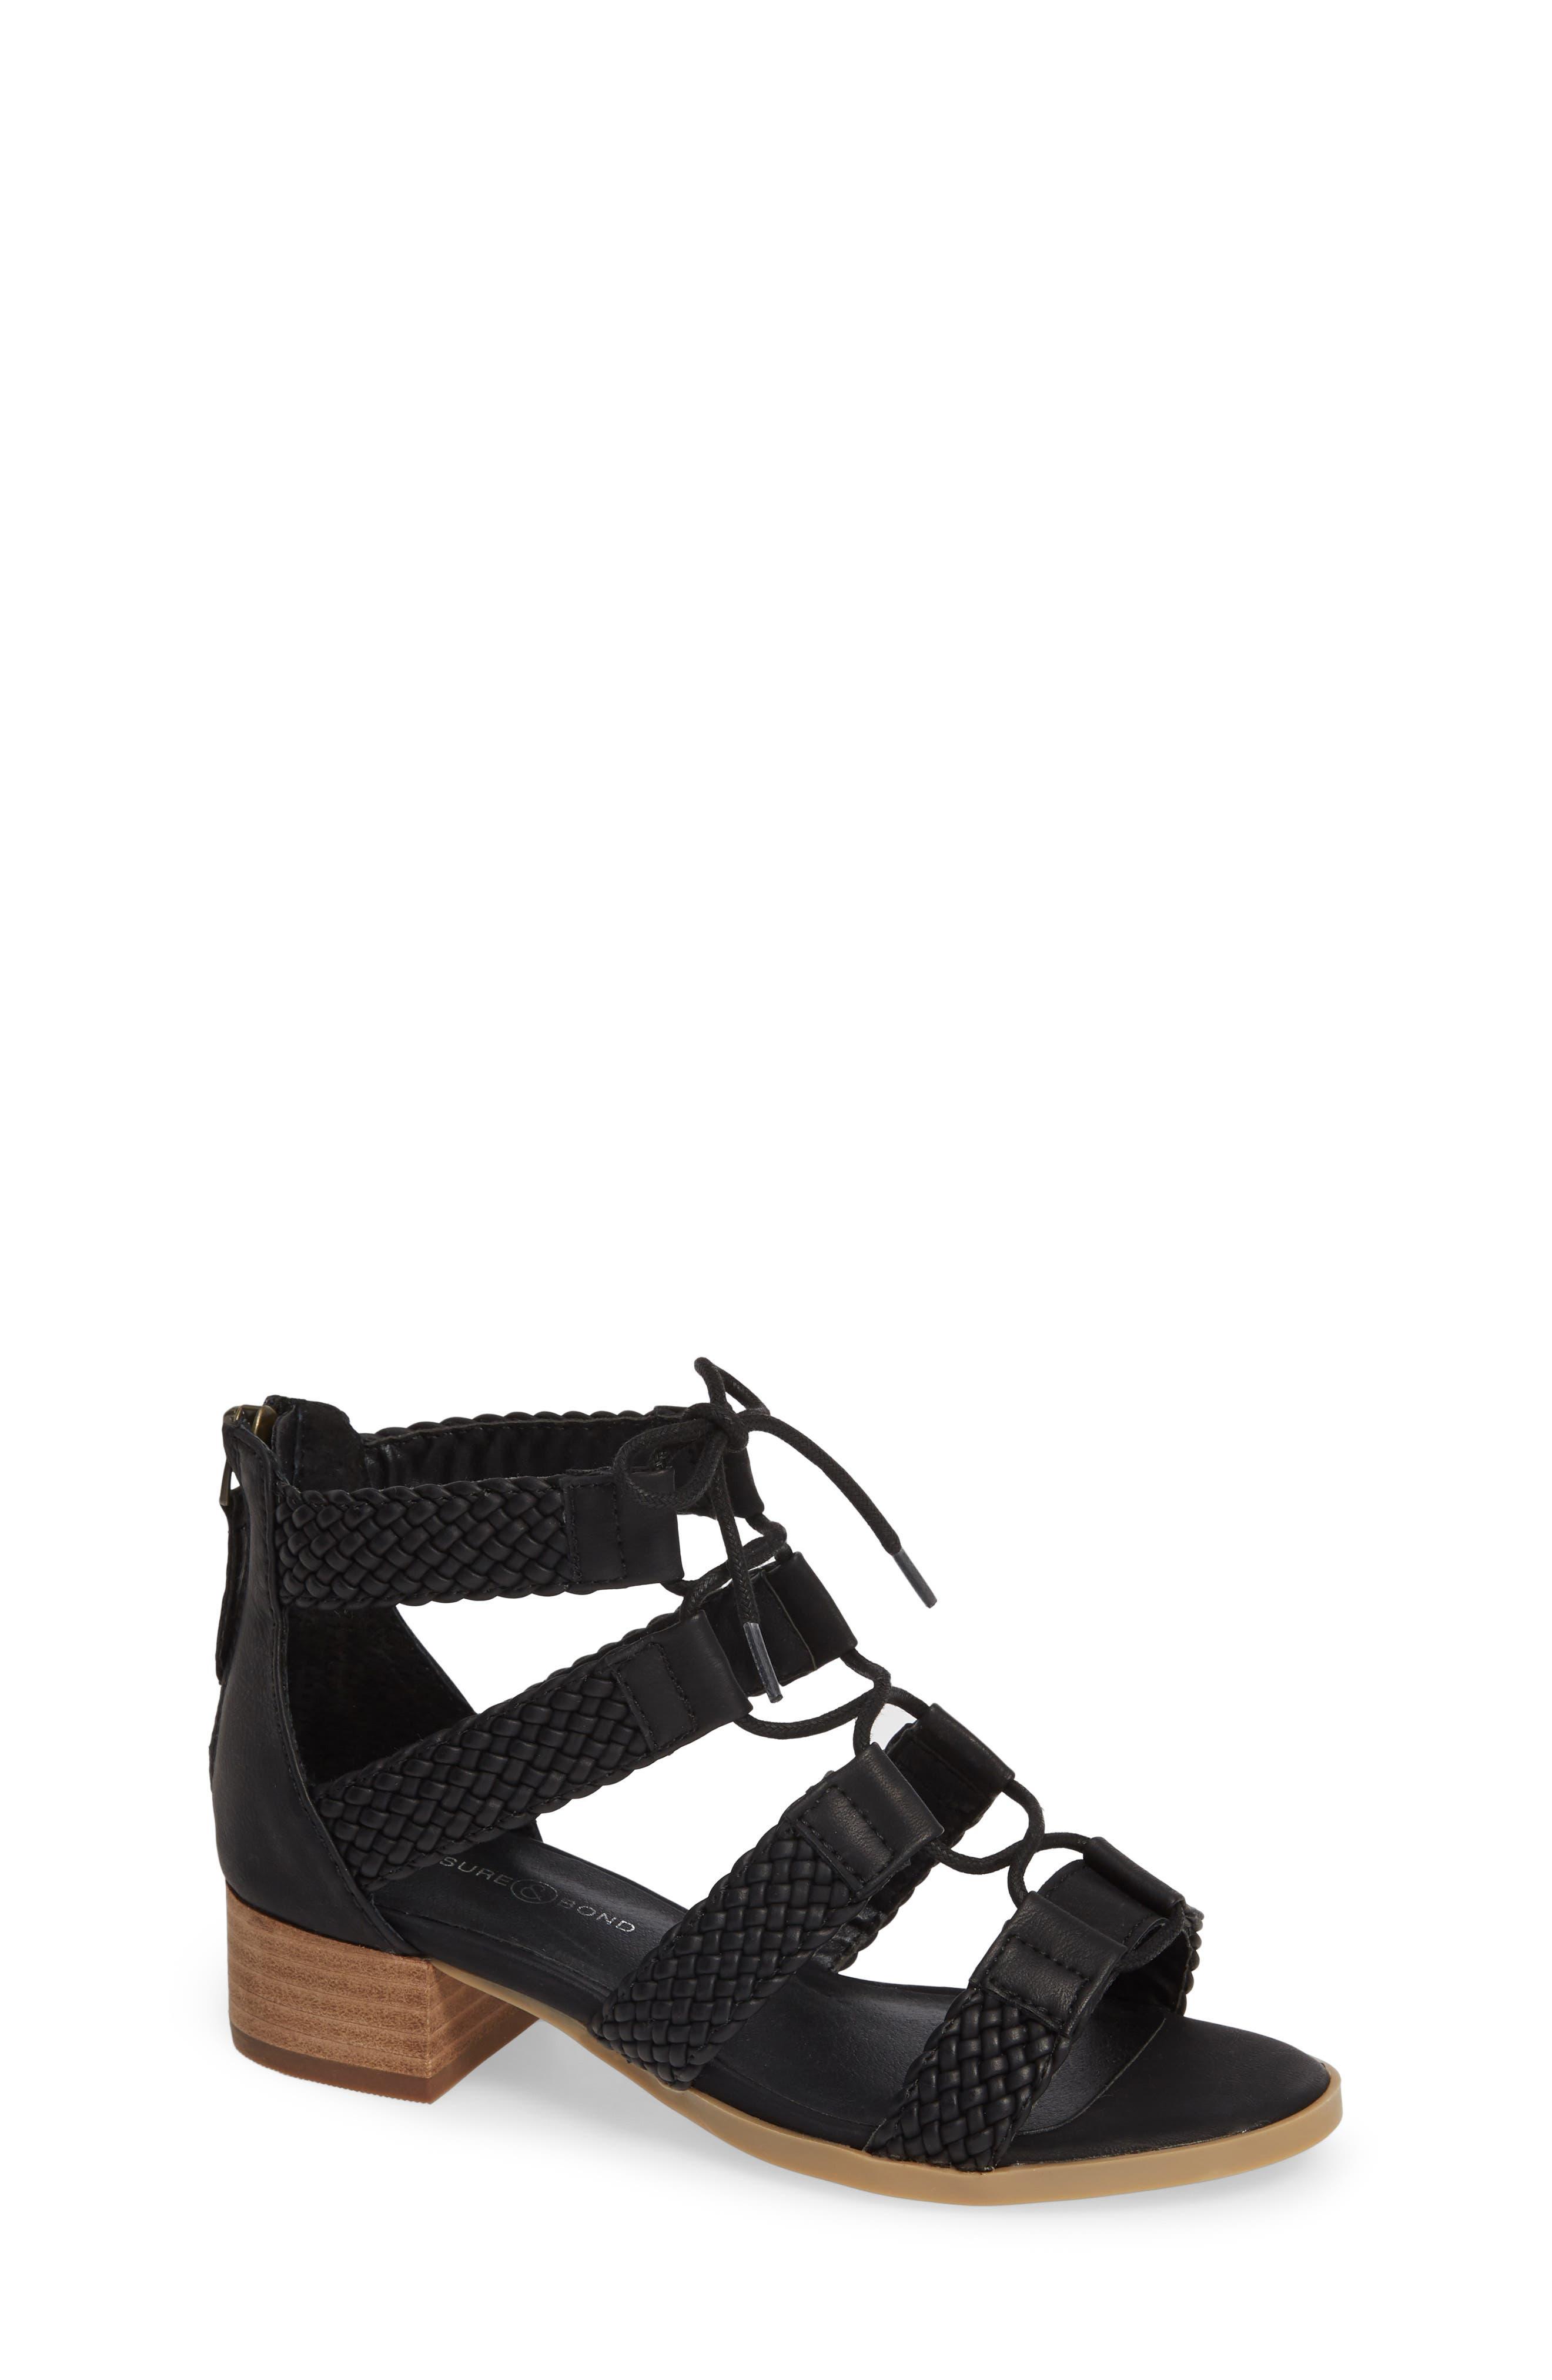 Layla Block Heel Sandal, Main, color, BLACK FAUX LEATHER